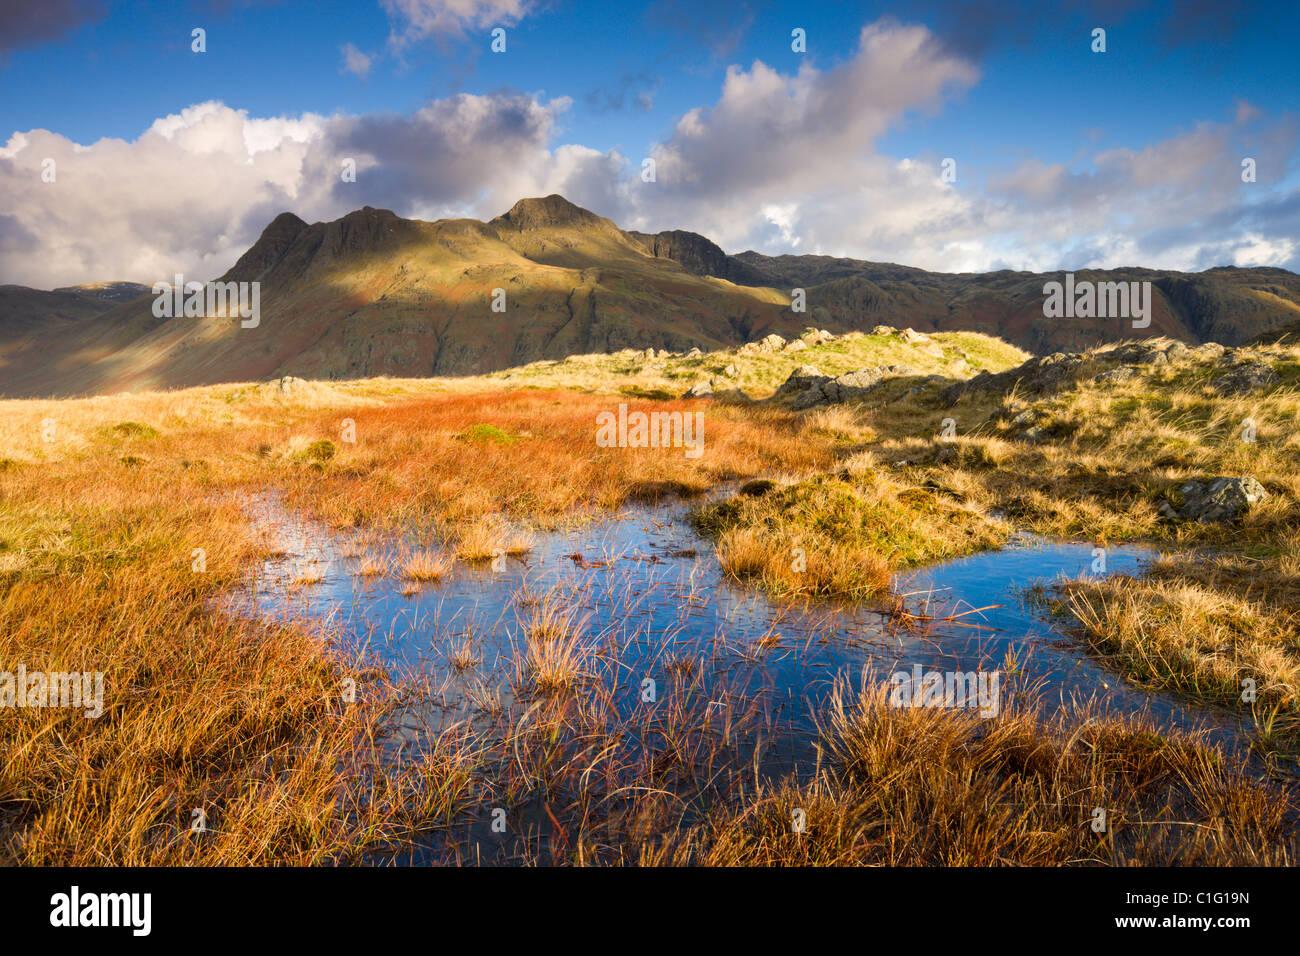 El Langdale Pikes, Lake District National Park, Cumbria, Inglaterra. Otoño (noviembre de 2010). Imagen De Stock